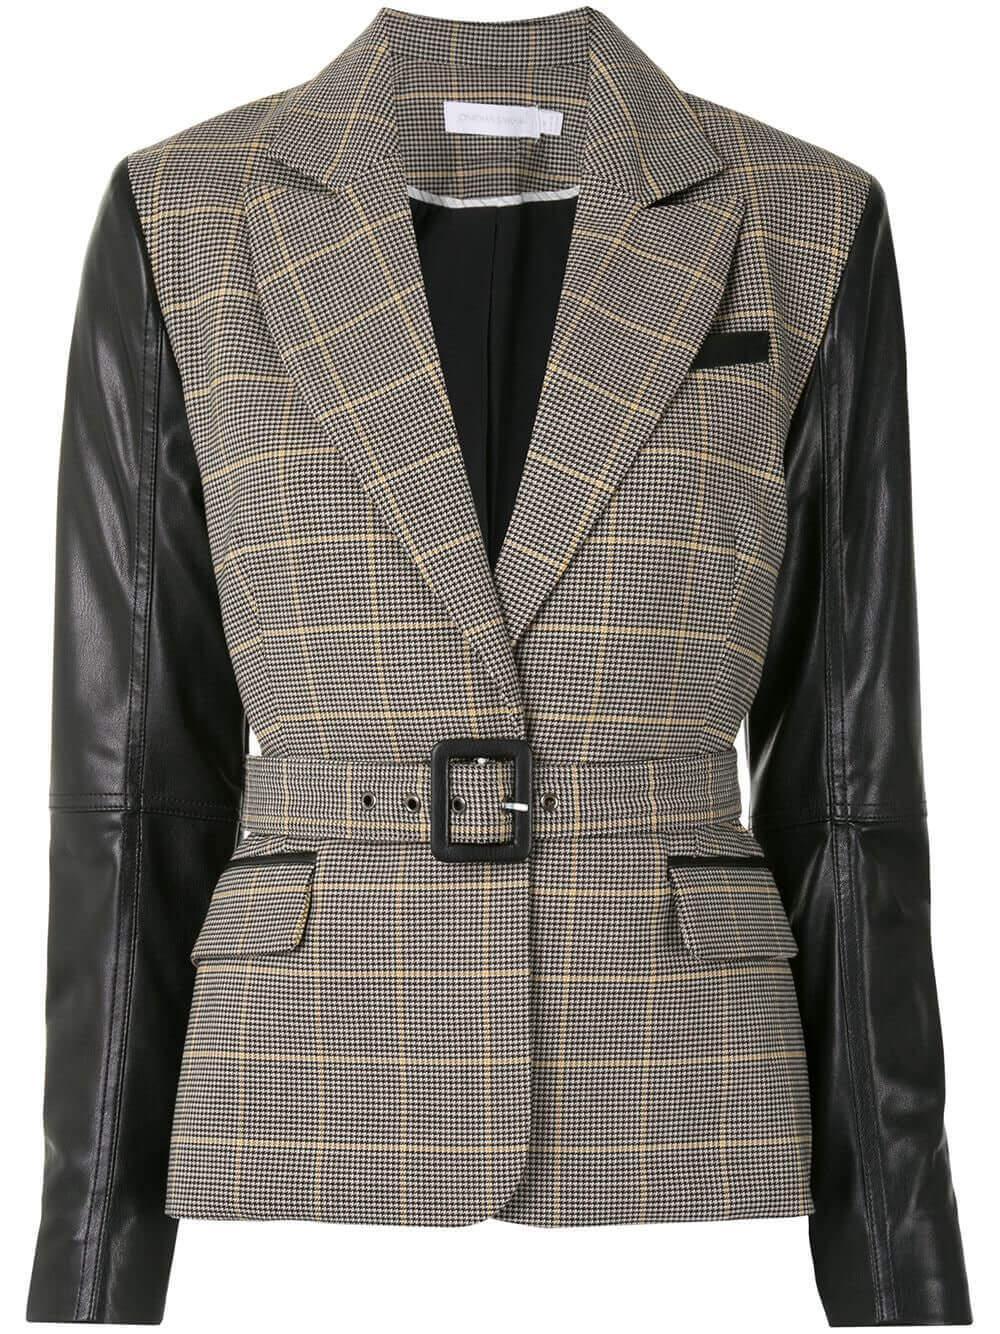 Zuri Mixed Wool Tailoring Combo Blazer Item # 520-6014-W